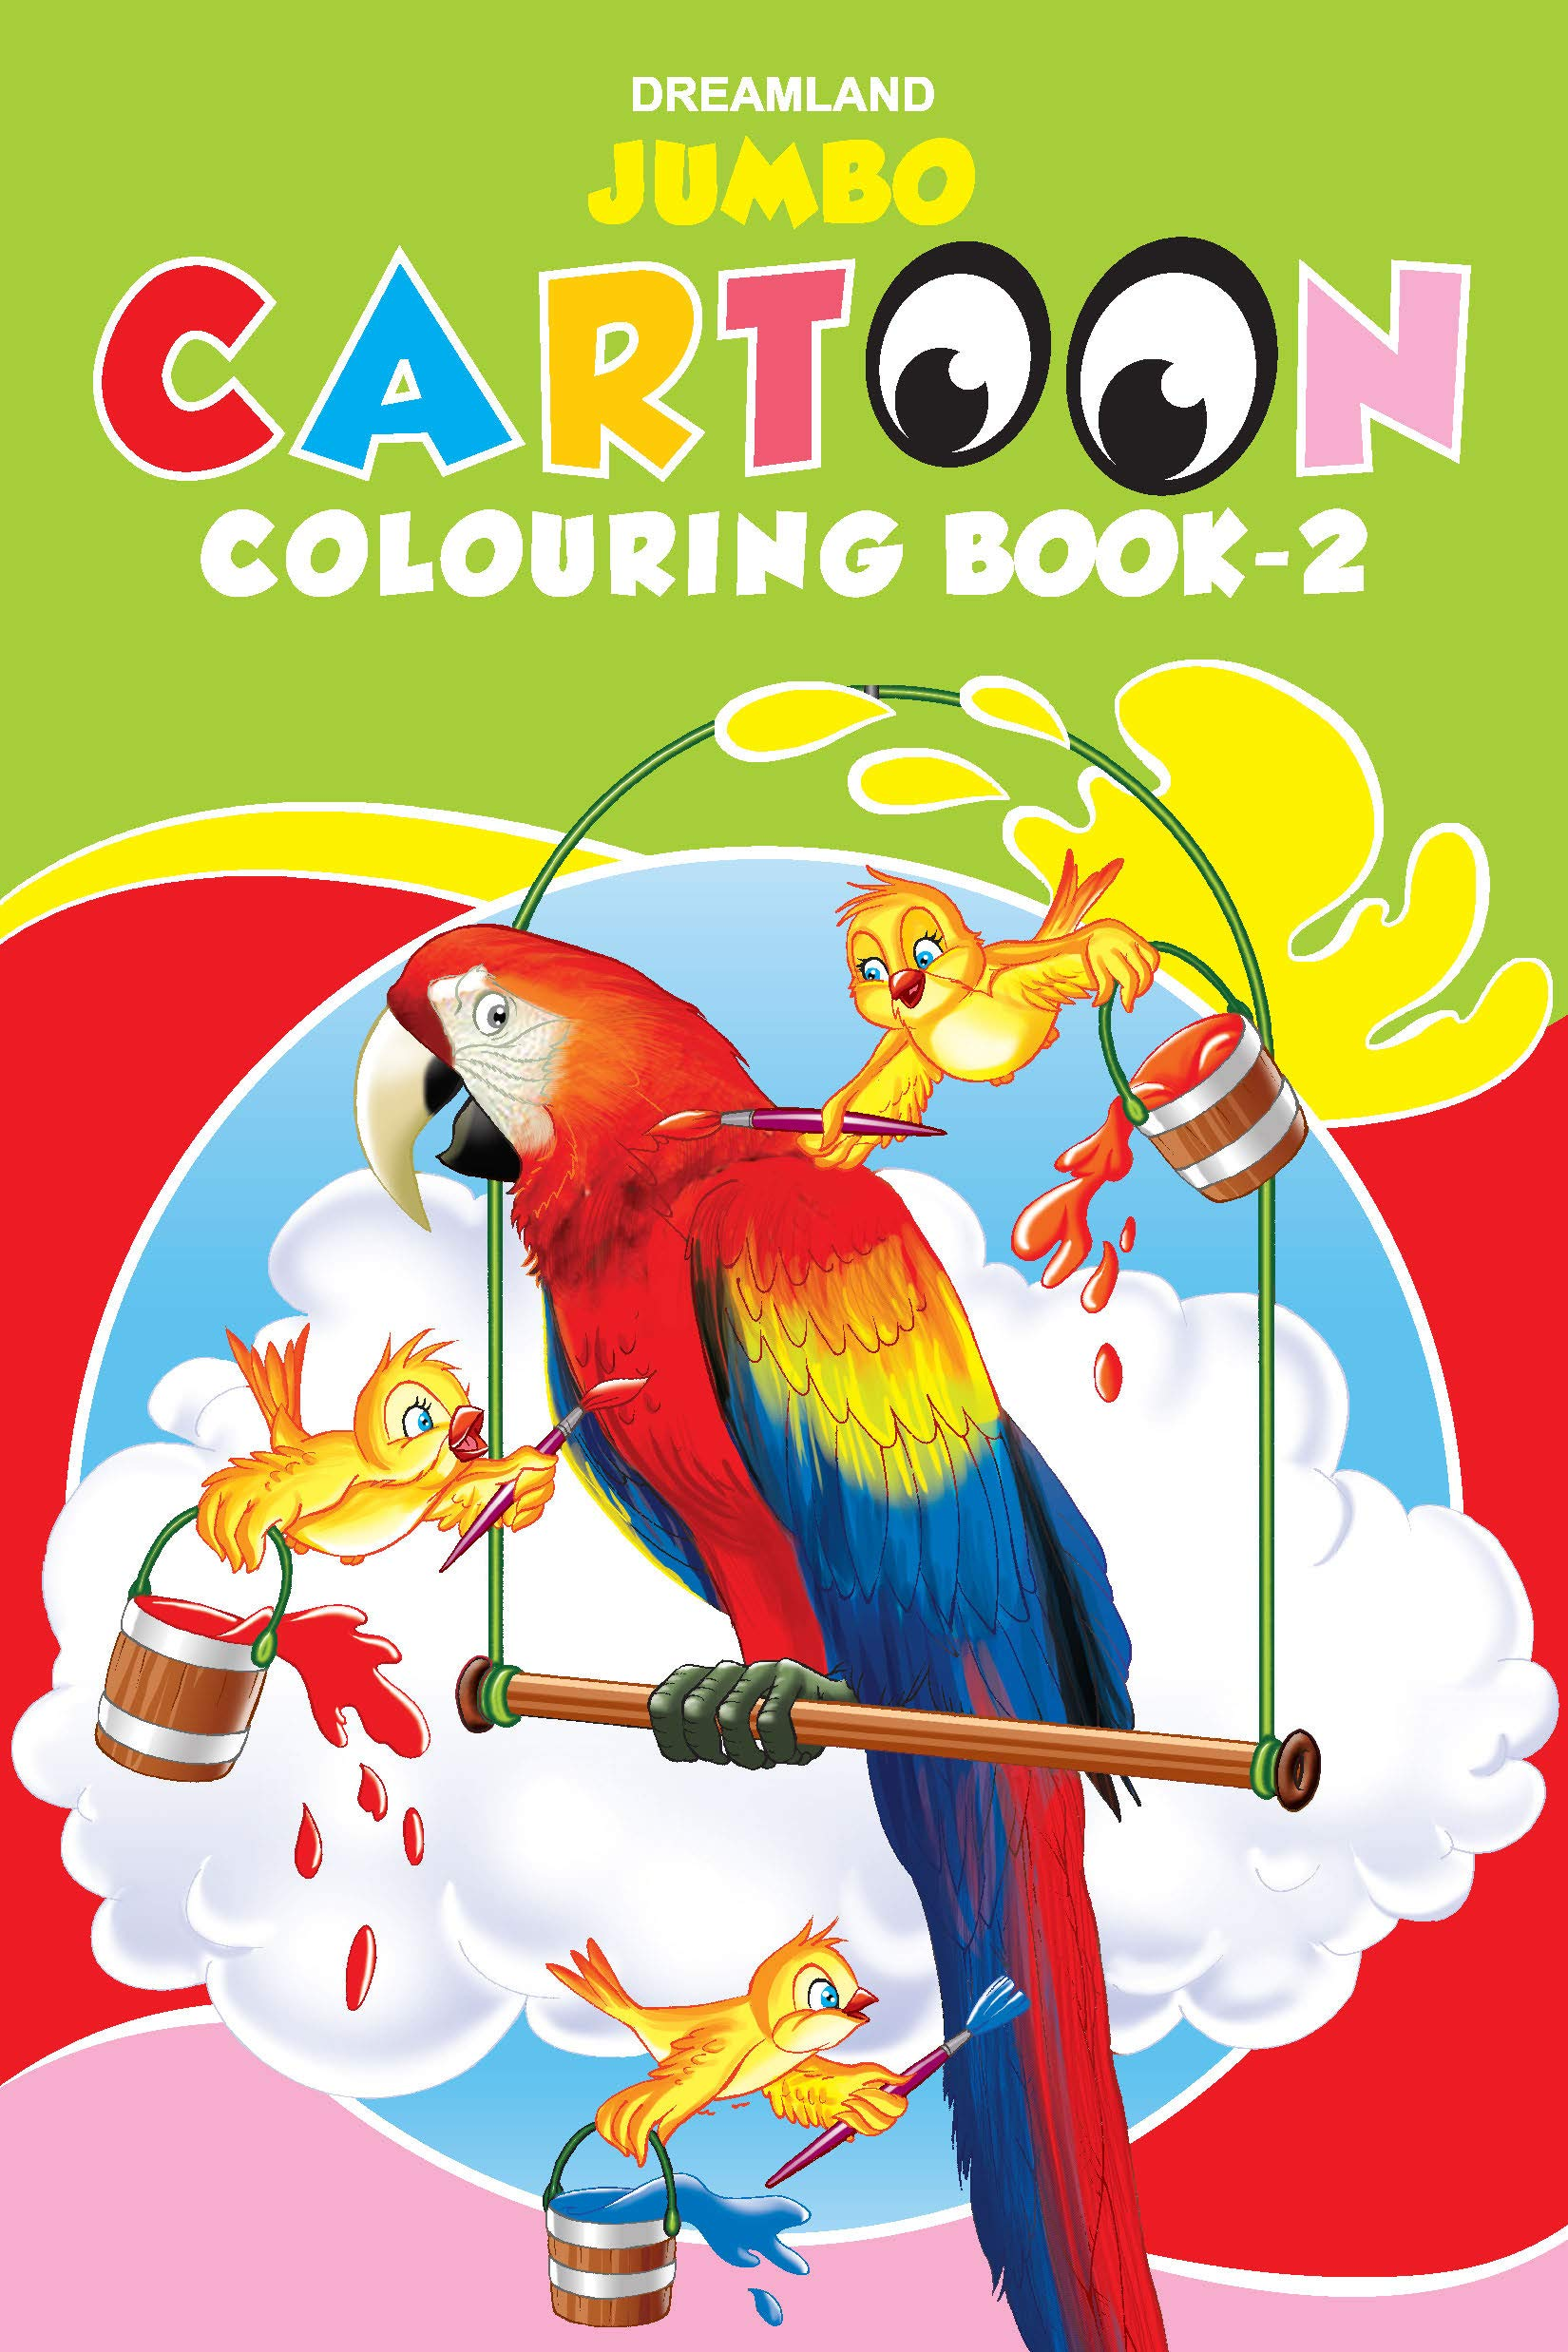 Jumbo Cartoon Colouring Book - 2